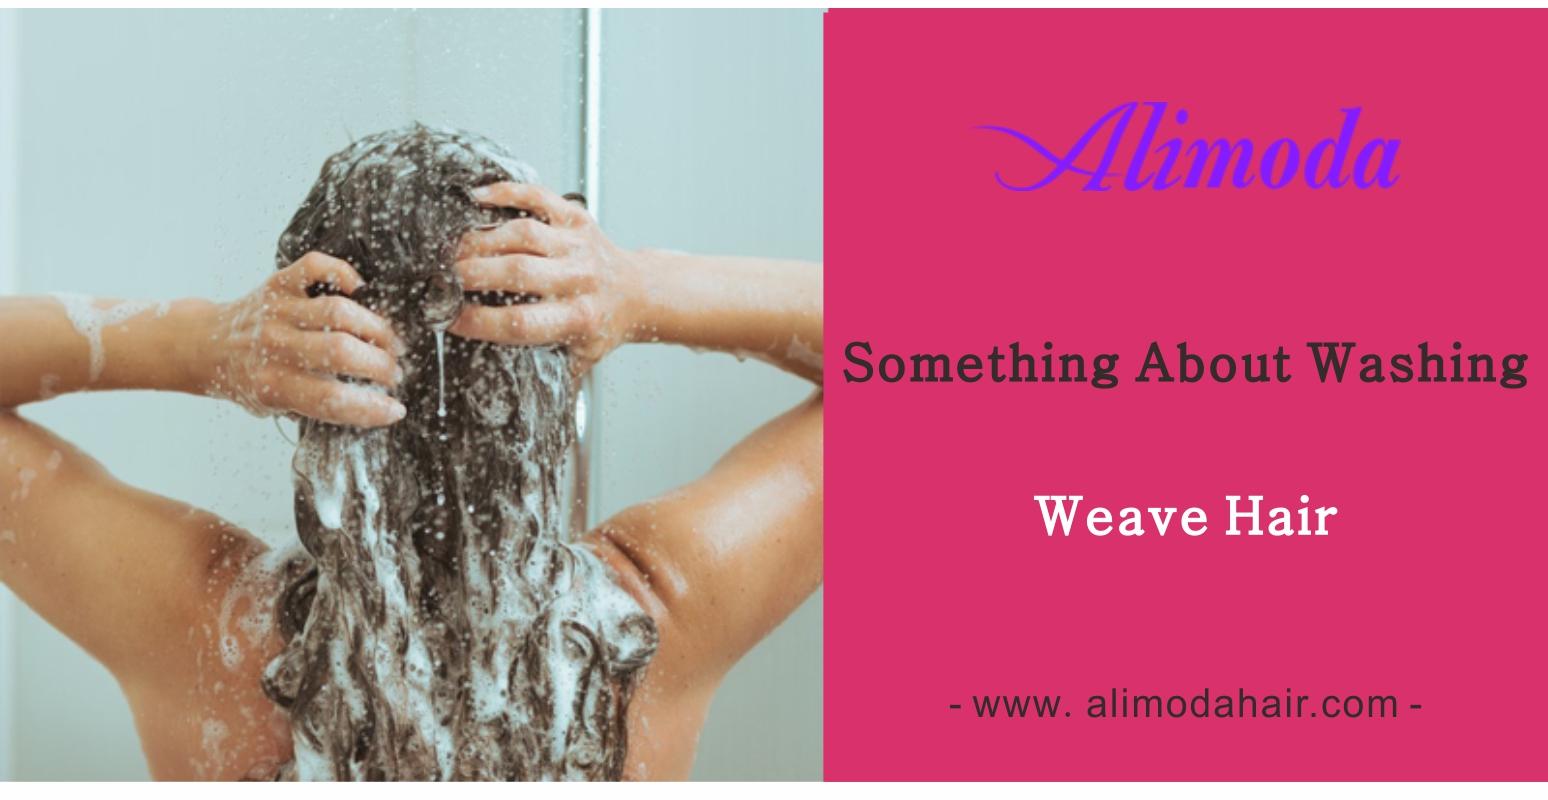 Something about washing weave hair